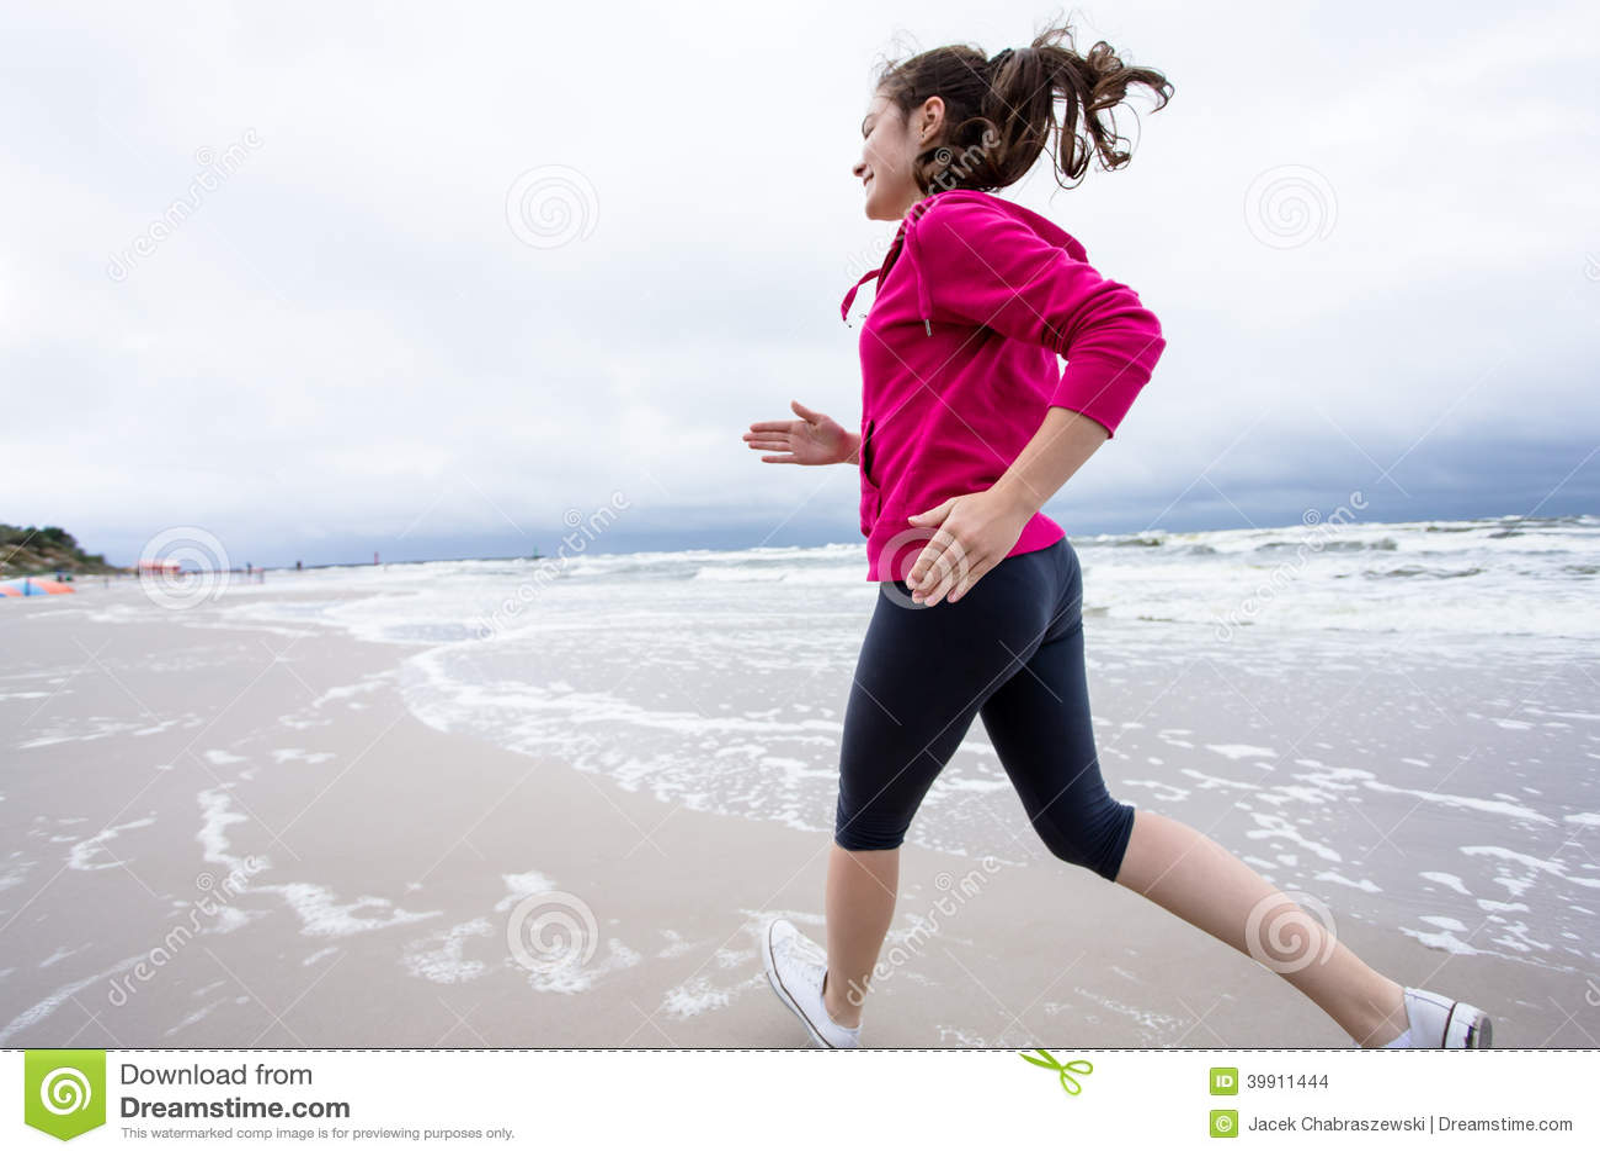 Girl Running On Beach Stock Photo - Image: 39911444 Girl Running On Beach